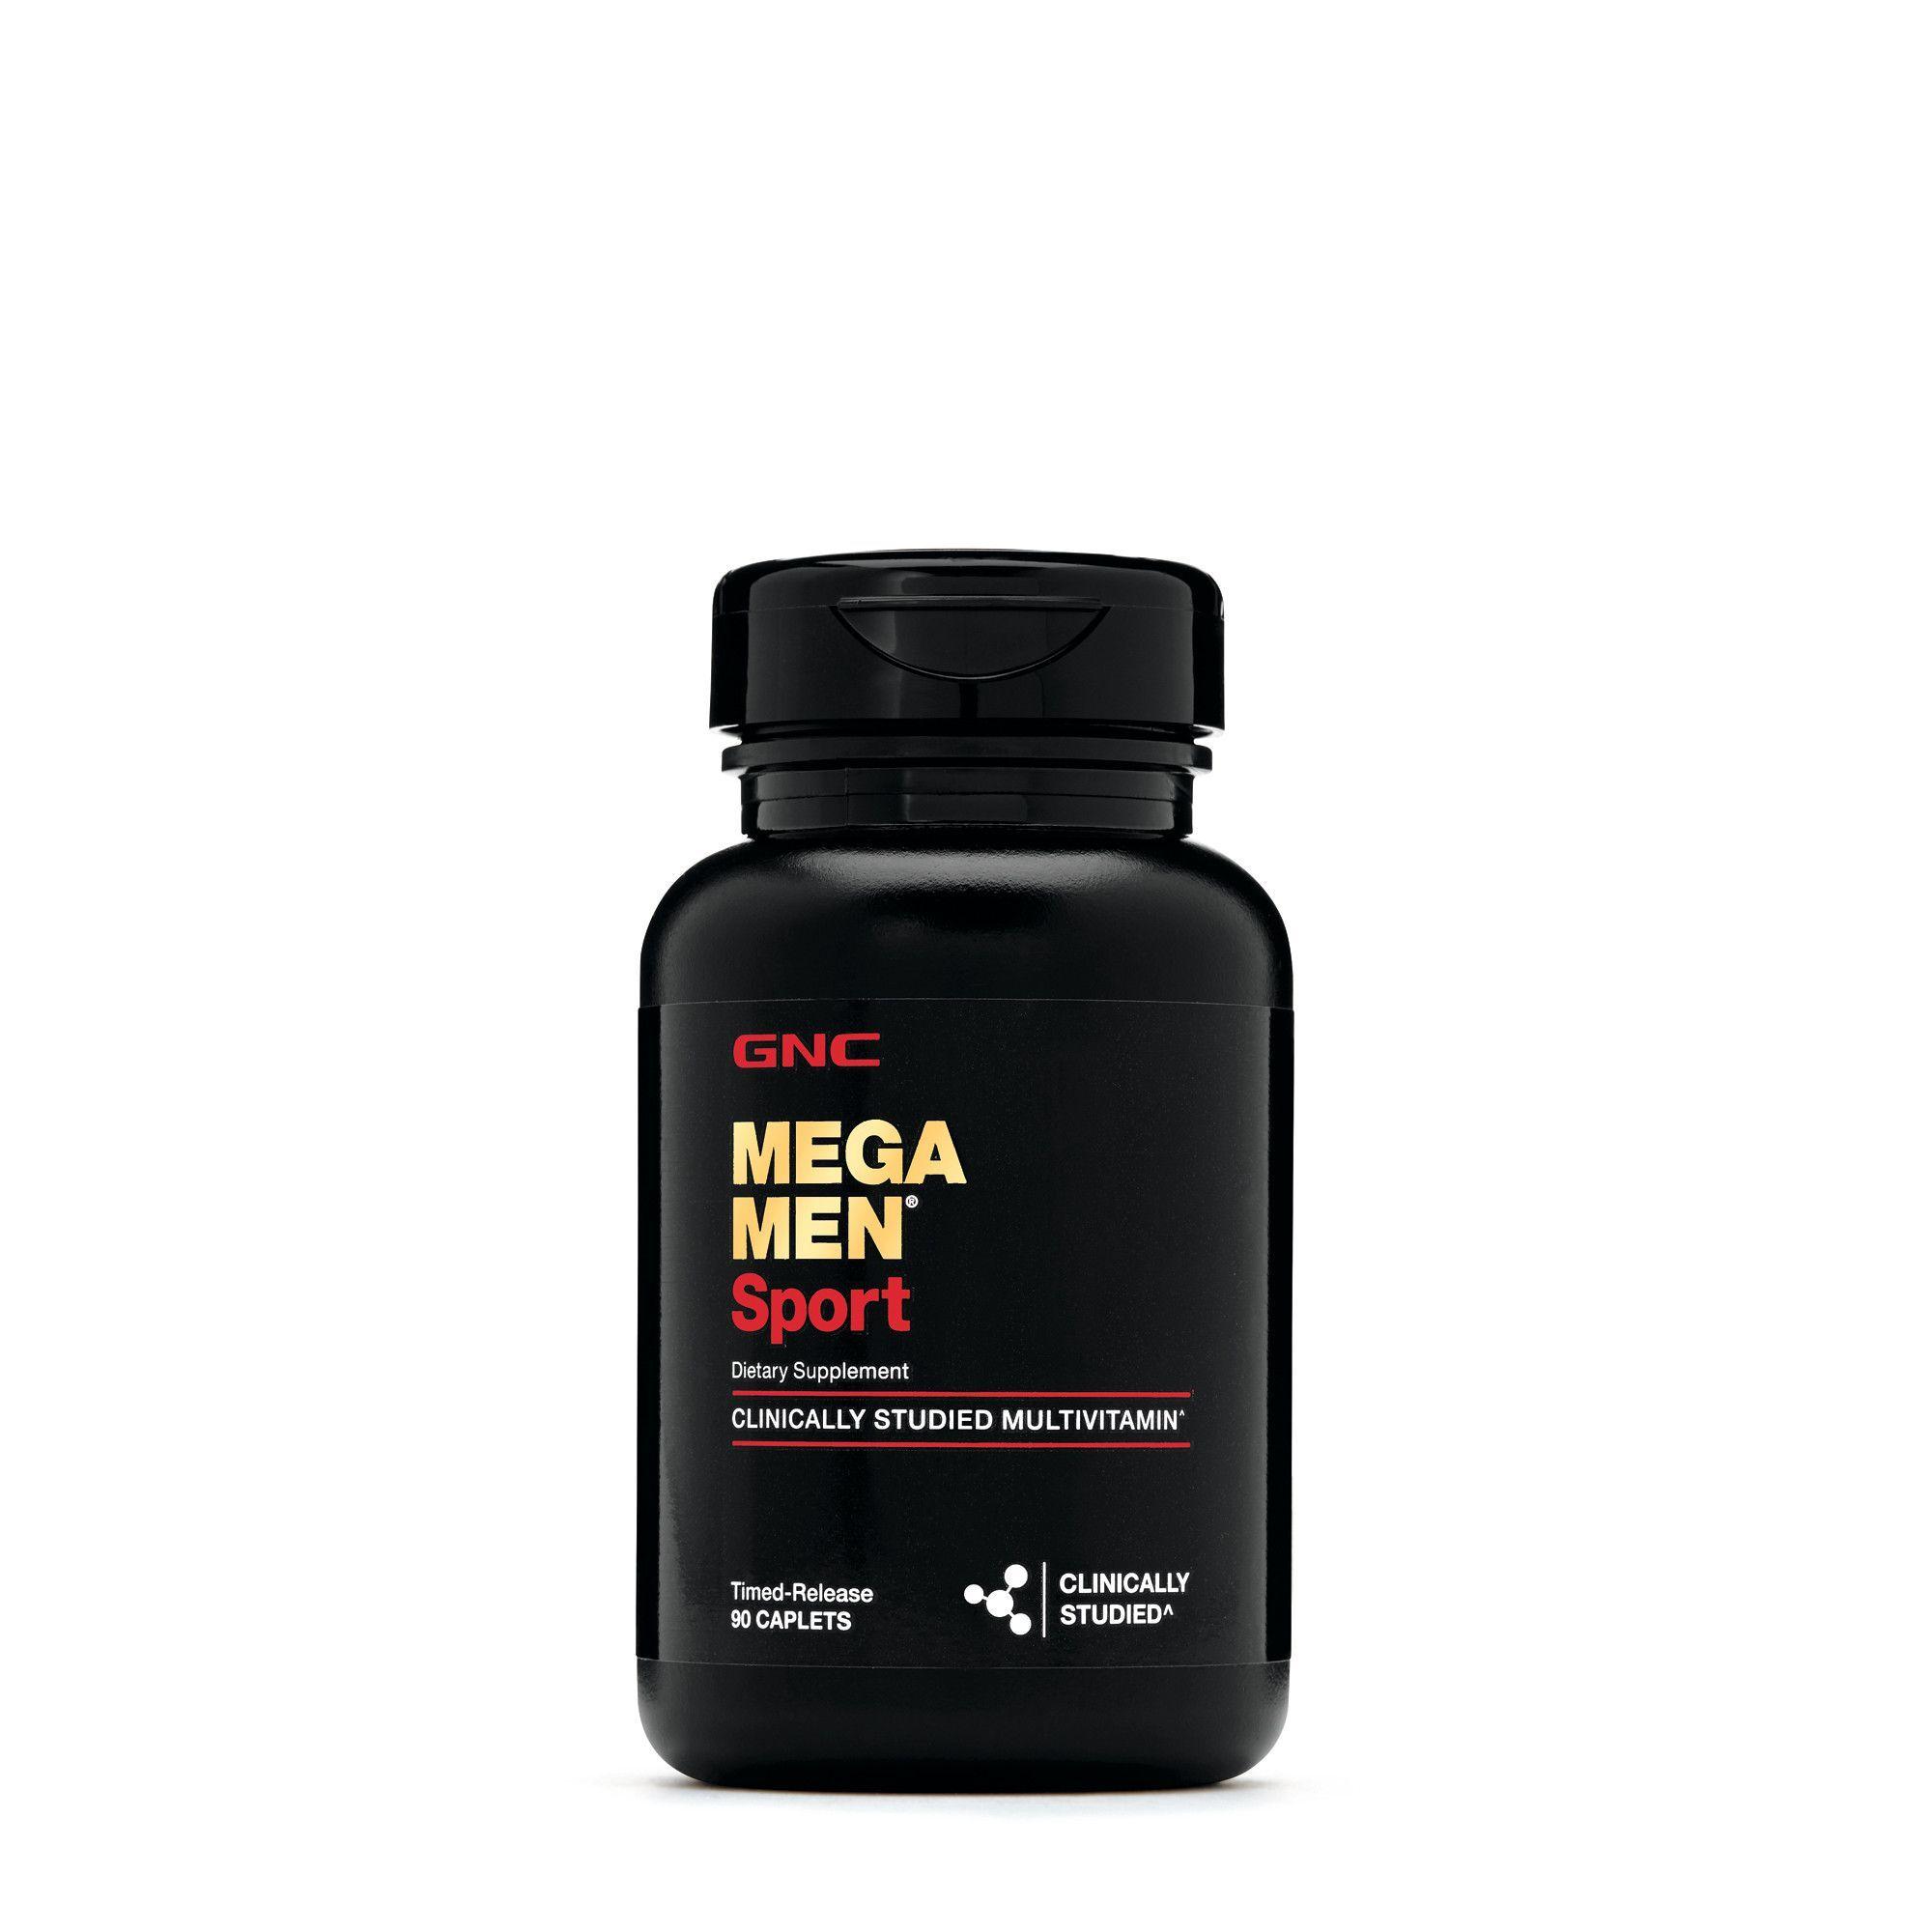 GNC Mega Men Sport Multivitamin, Men's